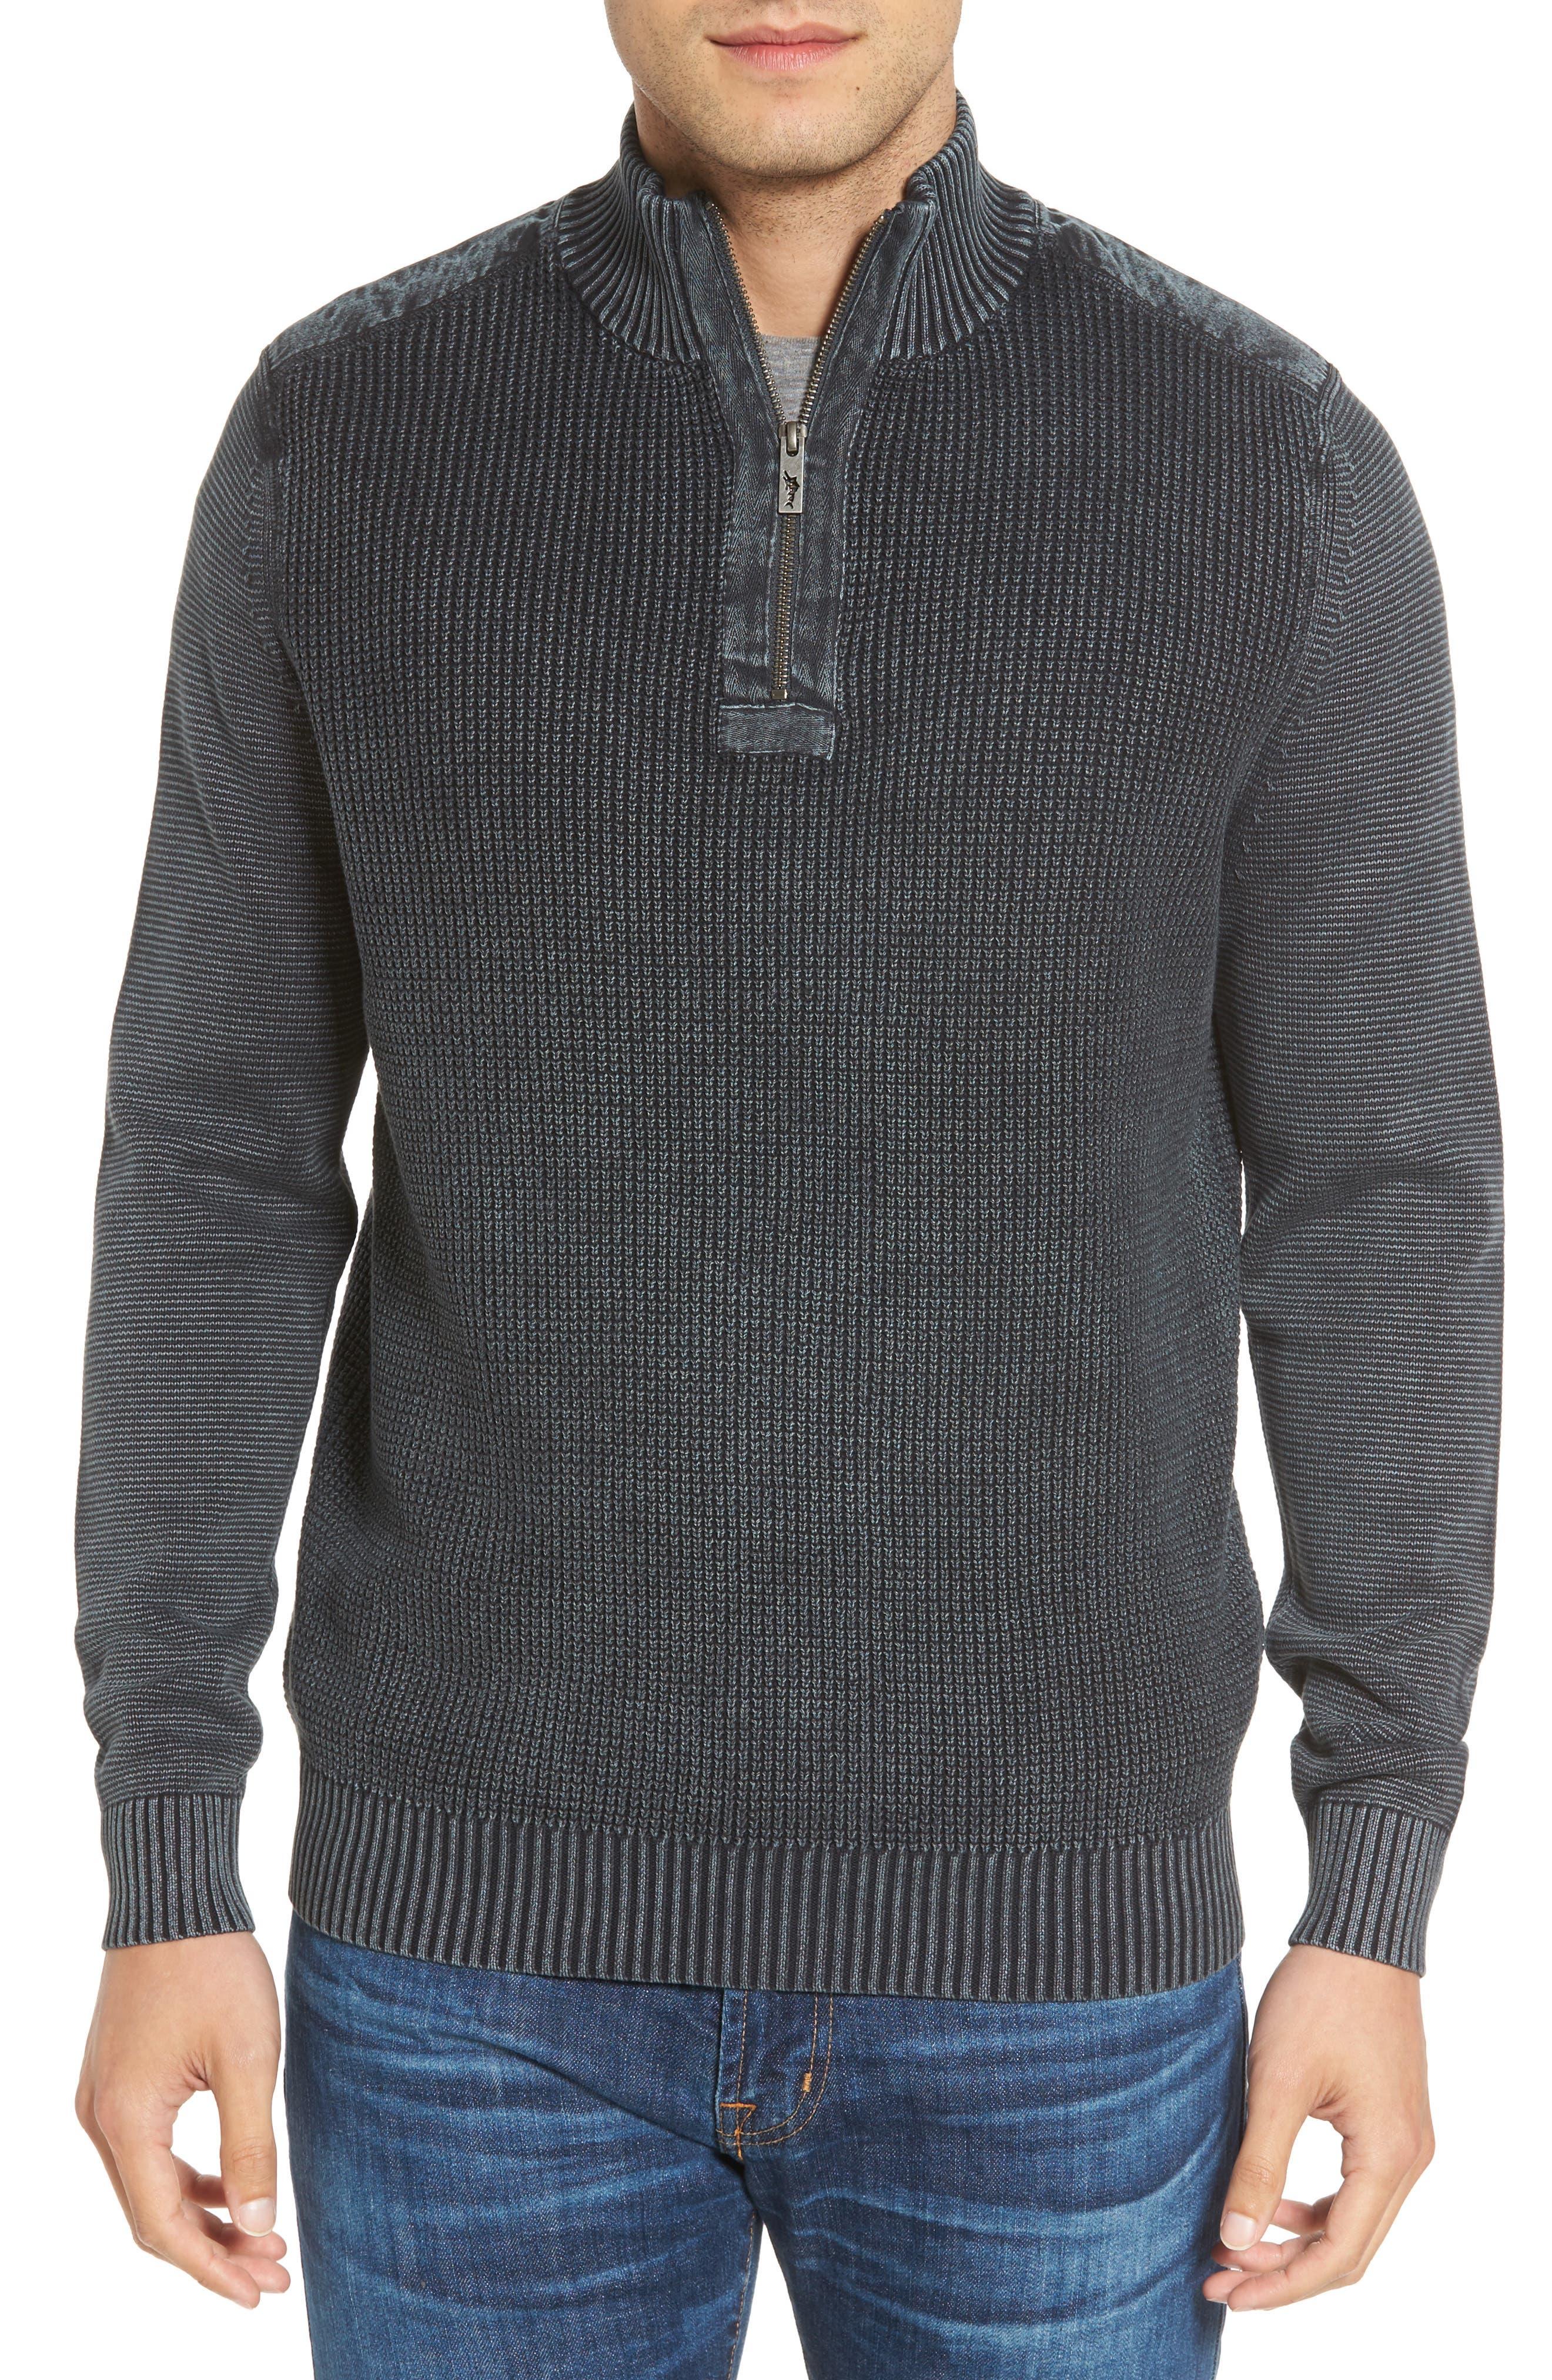 Alternate Image 1 Selected - Tommy Bahama Coastal Shores Quarter Zip Sweater